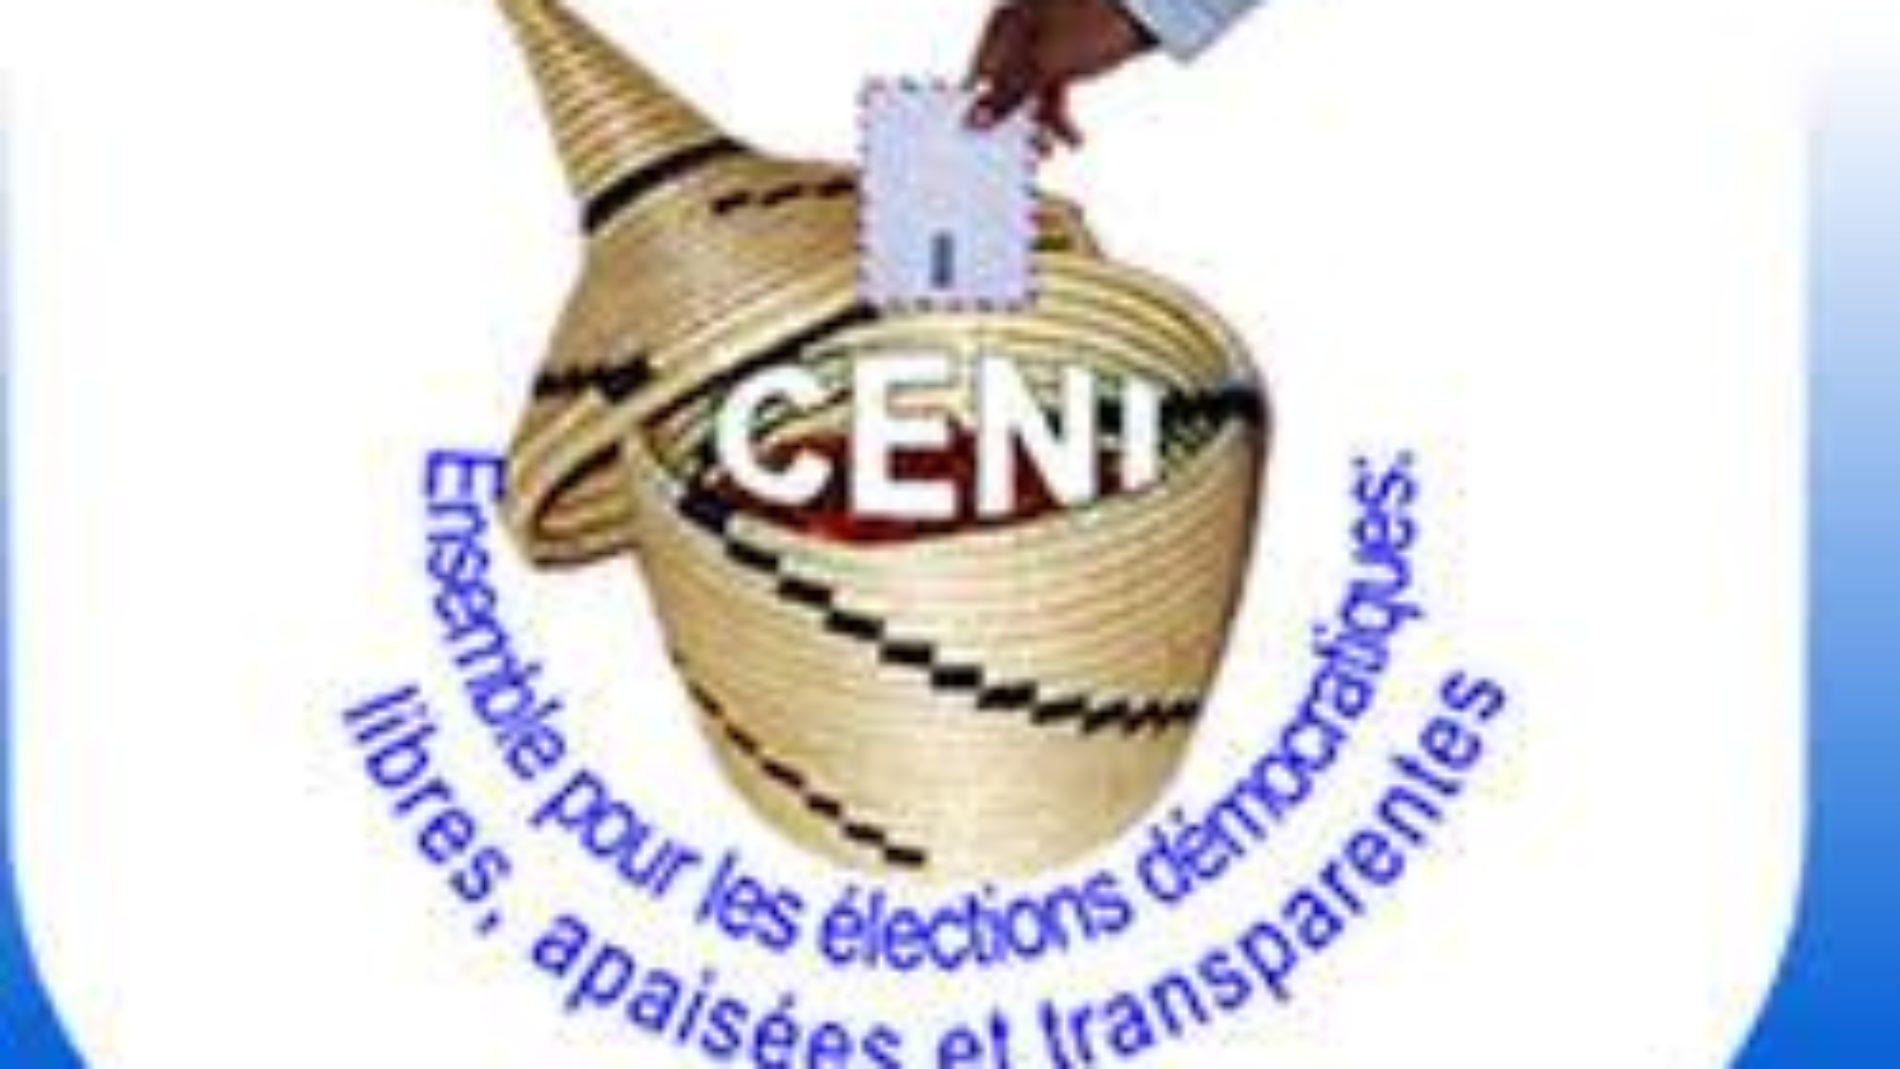 La coalition Kira-Burundi accuse la CENI d'être exclusive